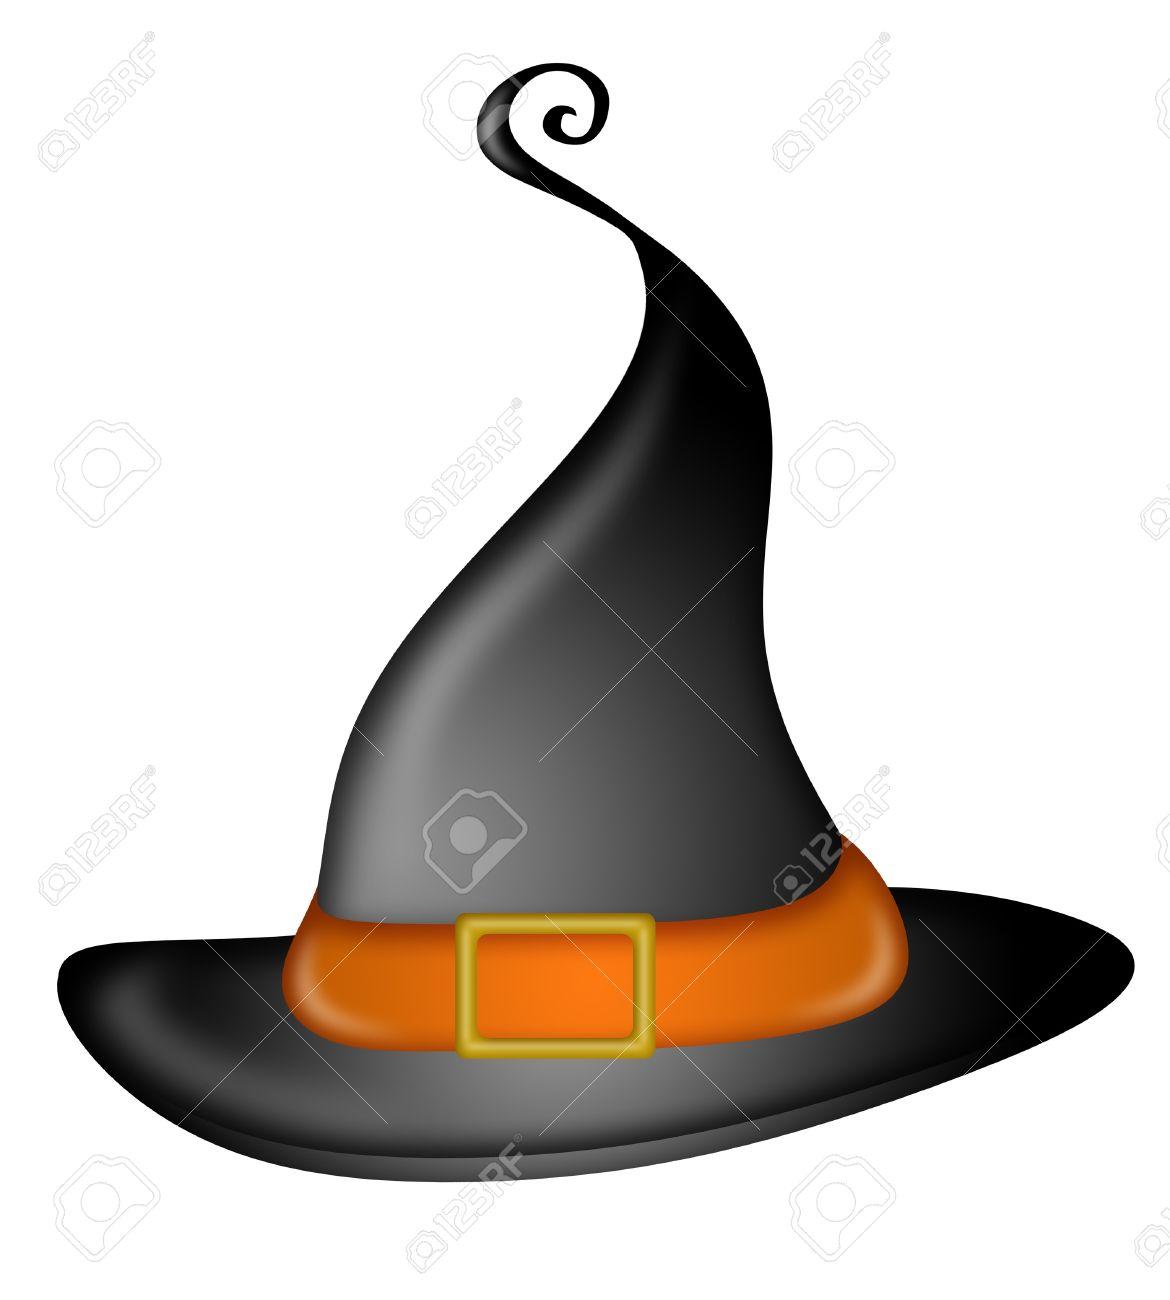 82c9f297eb2 Halloween Witches Hat Illustration Stock Illustration - 9063798